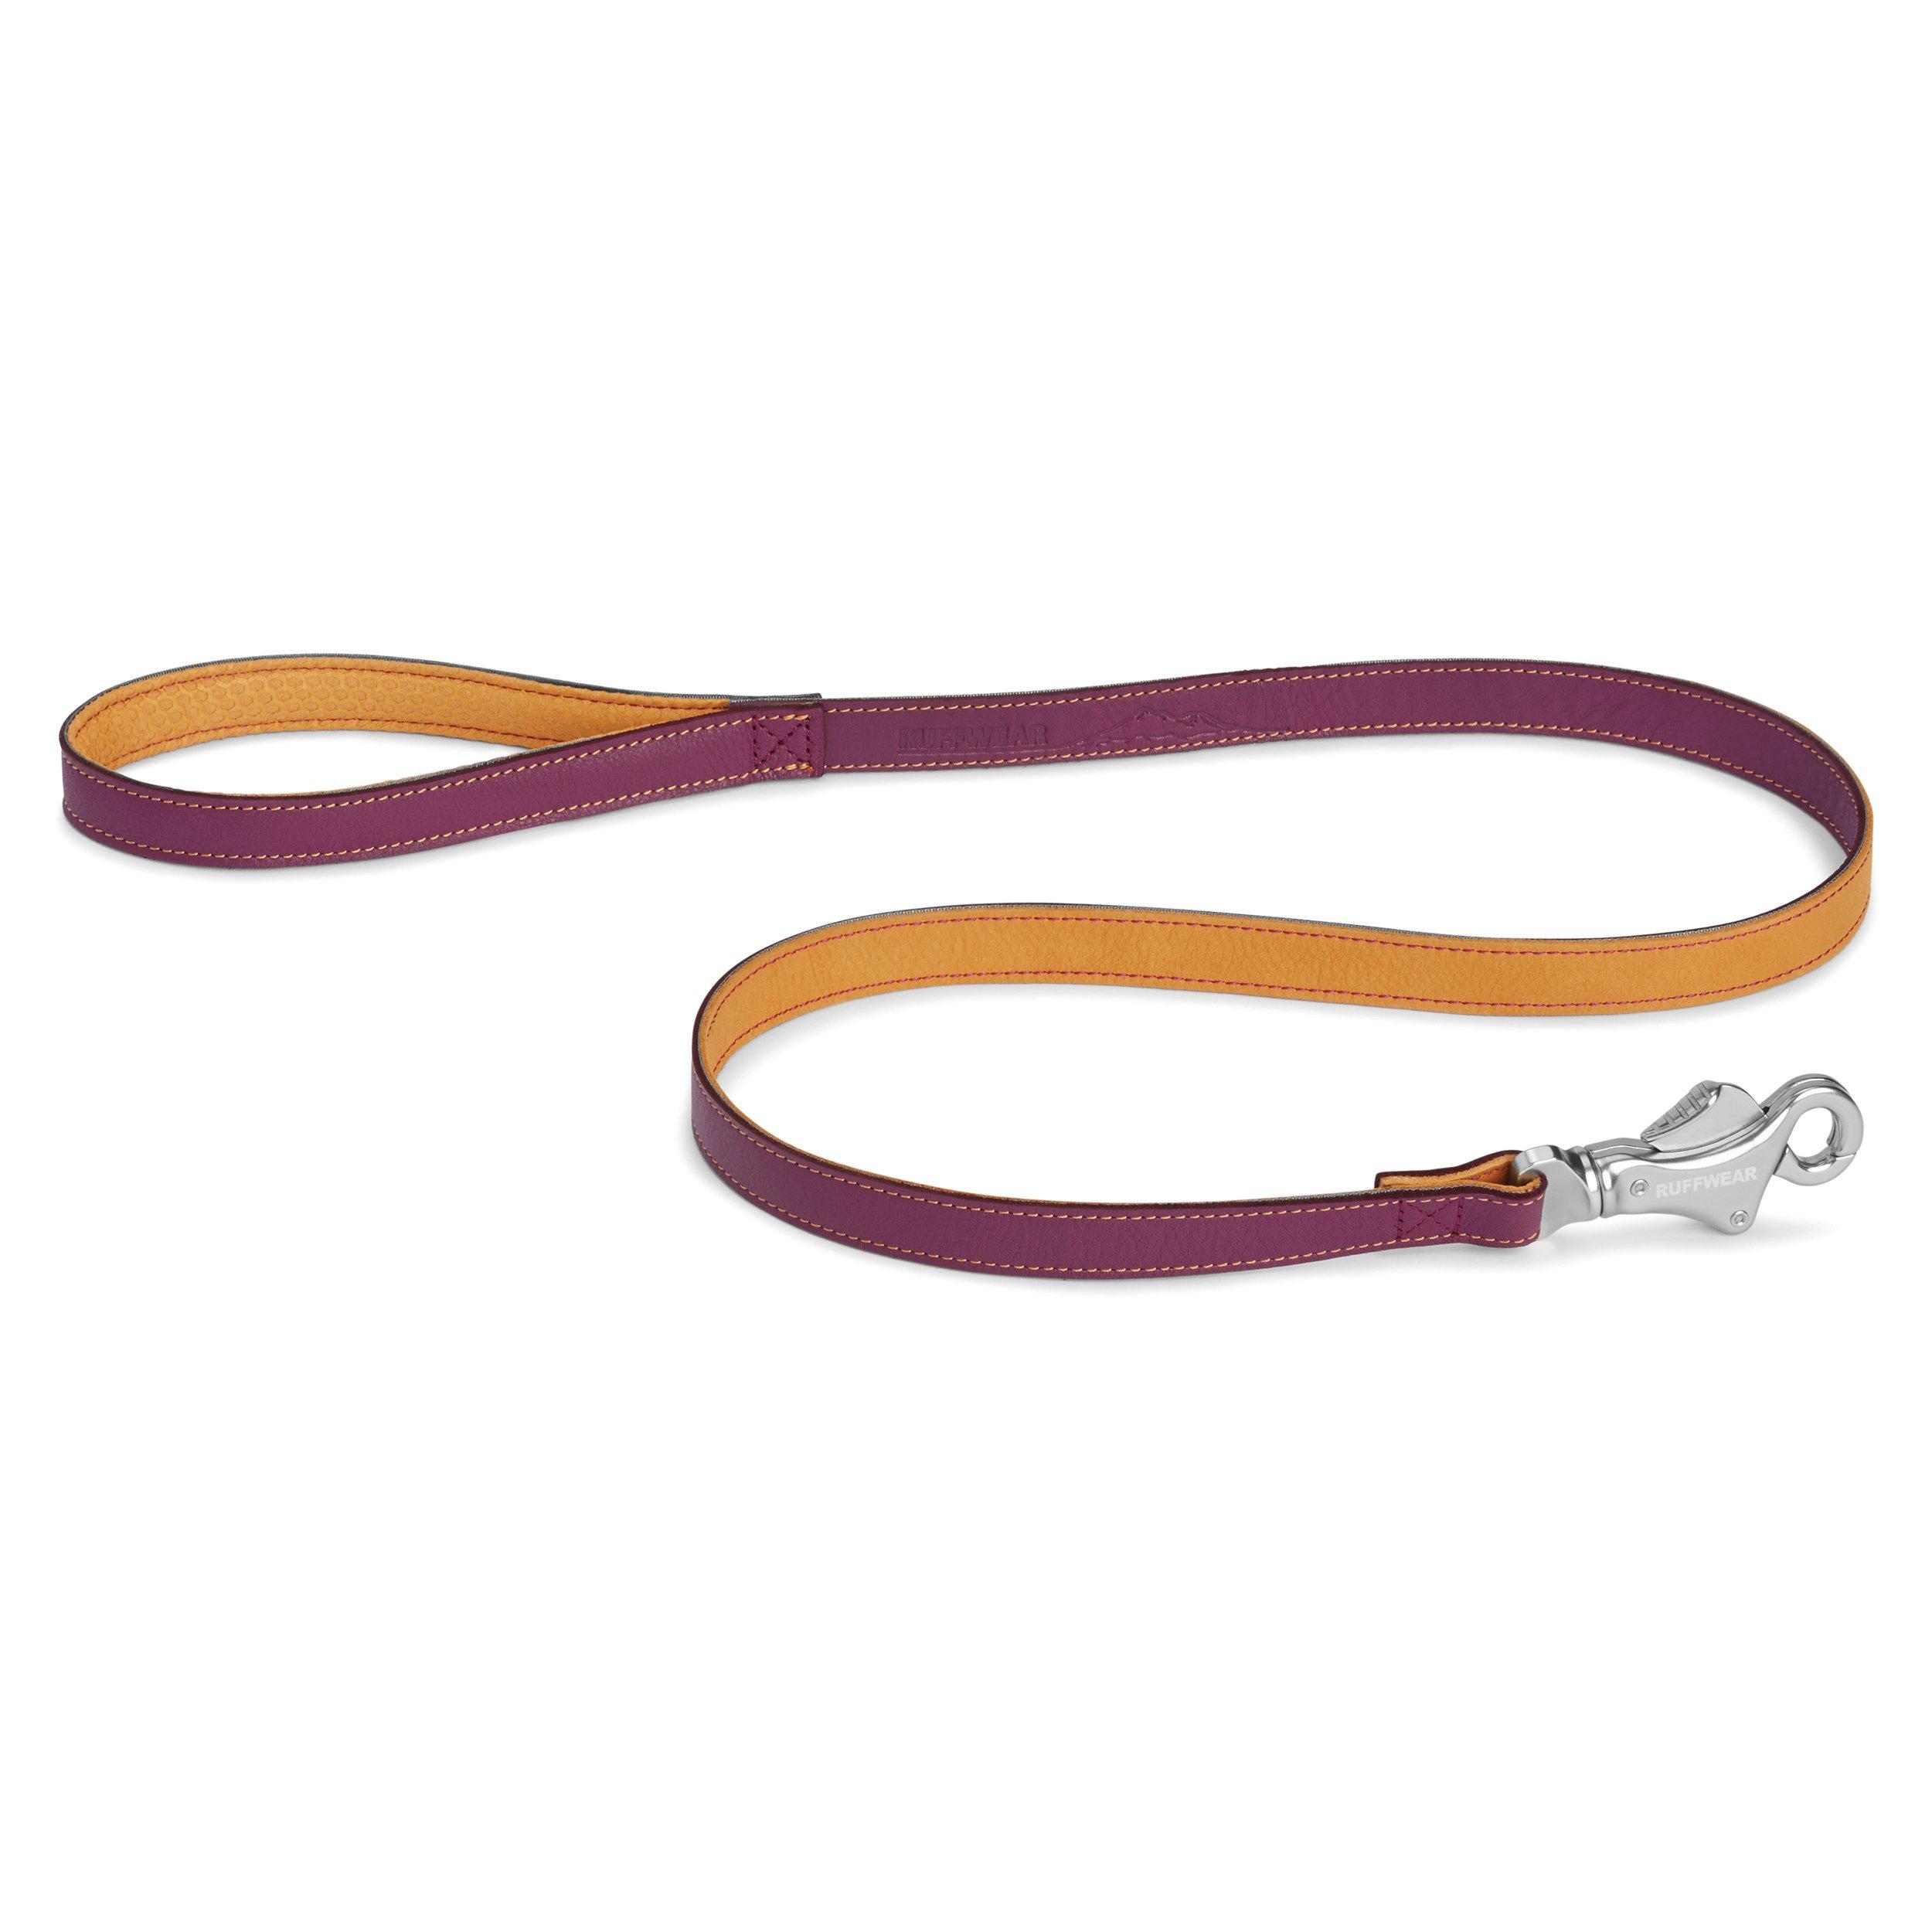 RUFFWEAR - Timberline, Wild Plum Purple